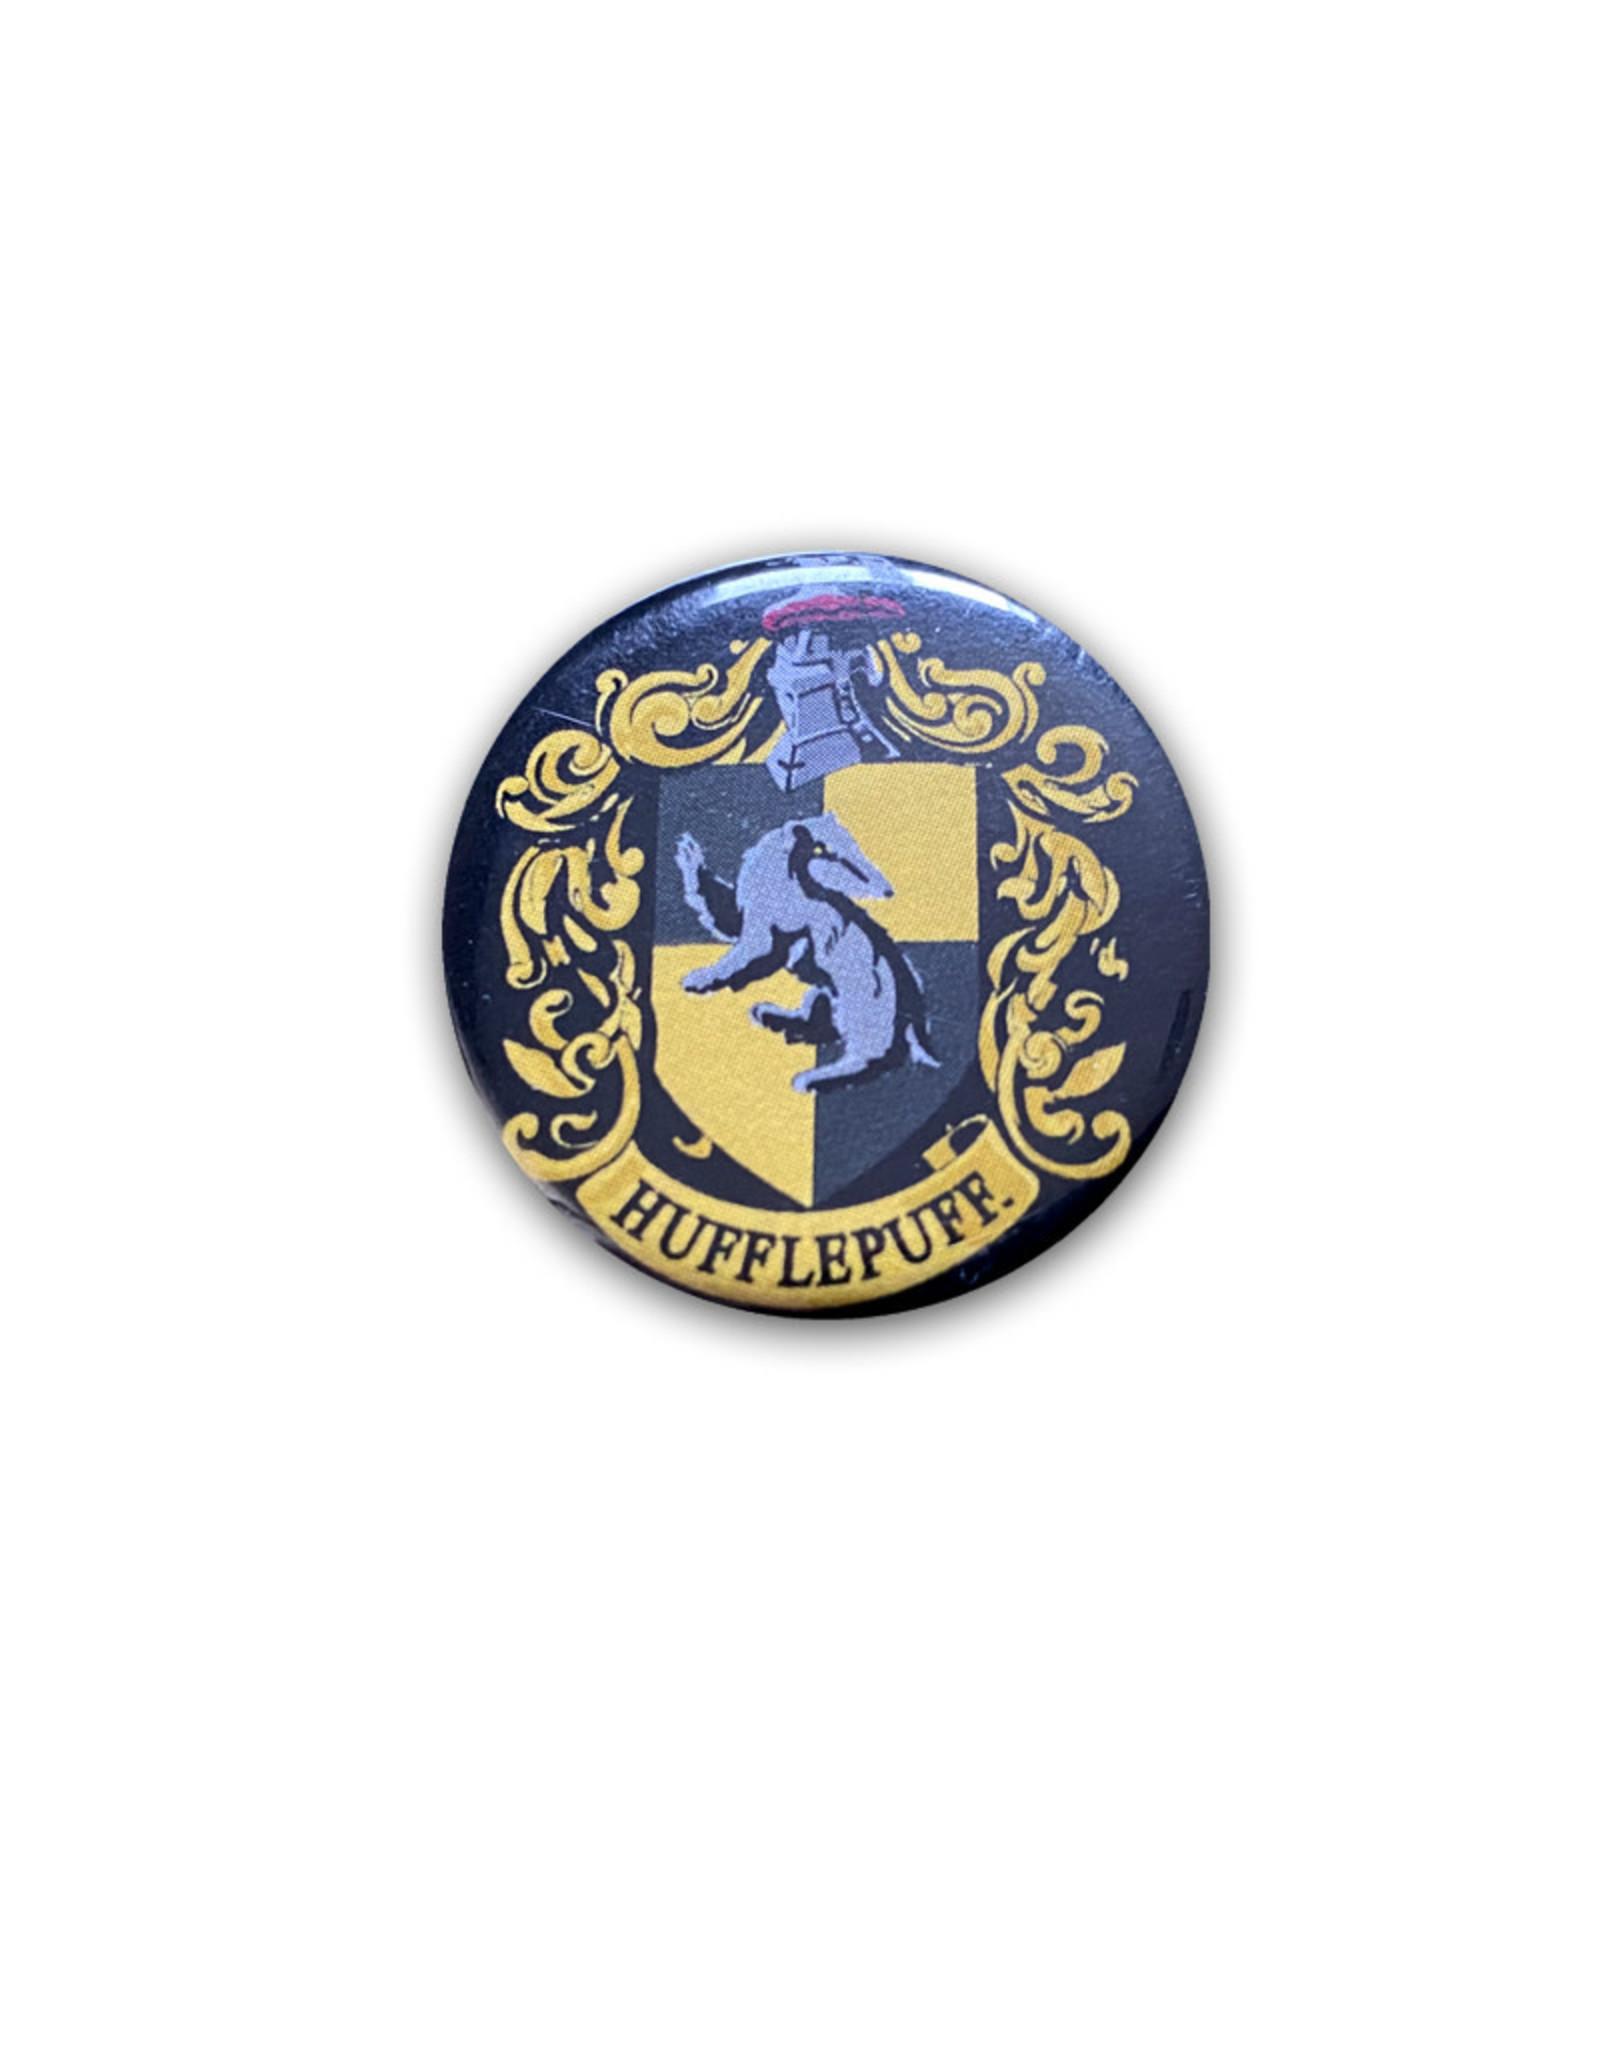 Harry Potter Harry Potter ( Button) Hufflepuff Crest